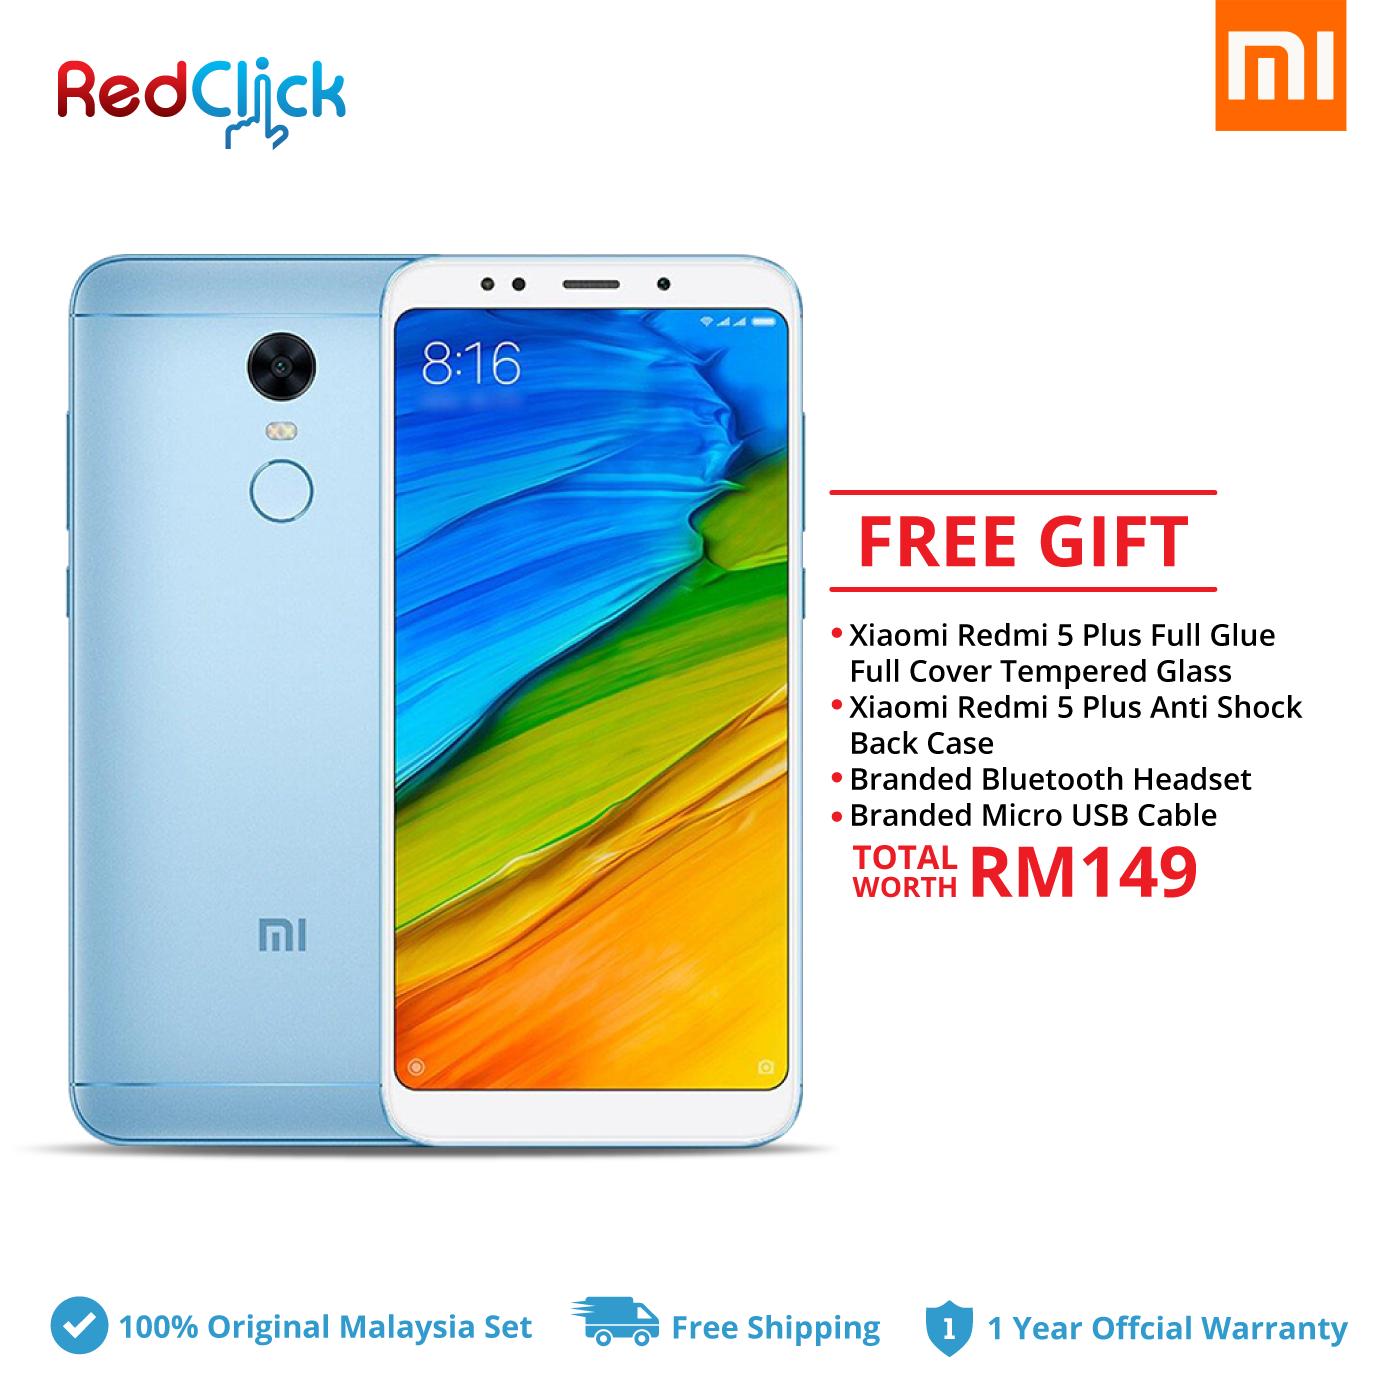 Xiaomi Redmi 5 Plus 4gb 64gb Original Malaysia Set 3gb 32gb Black